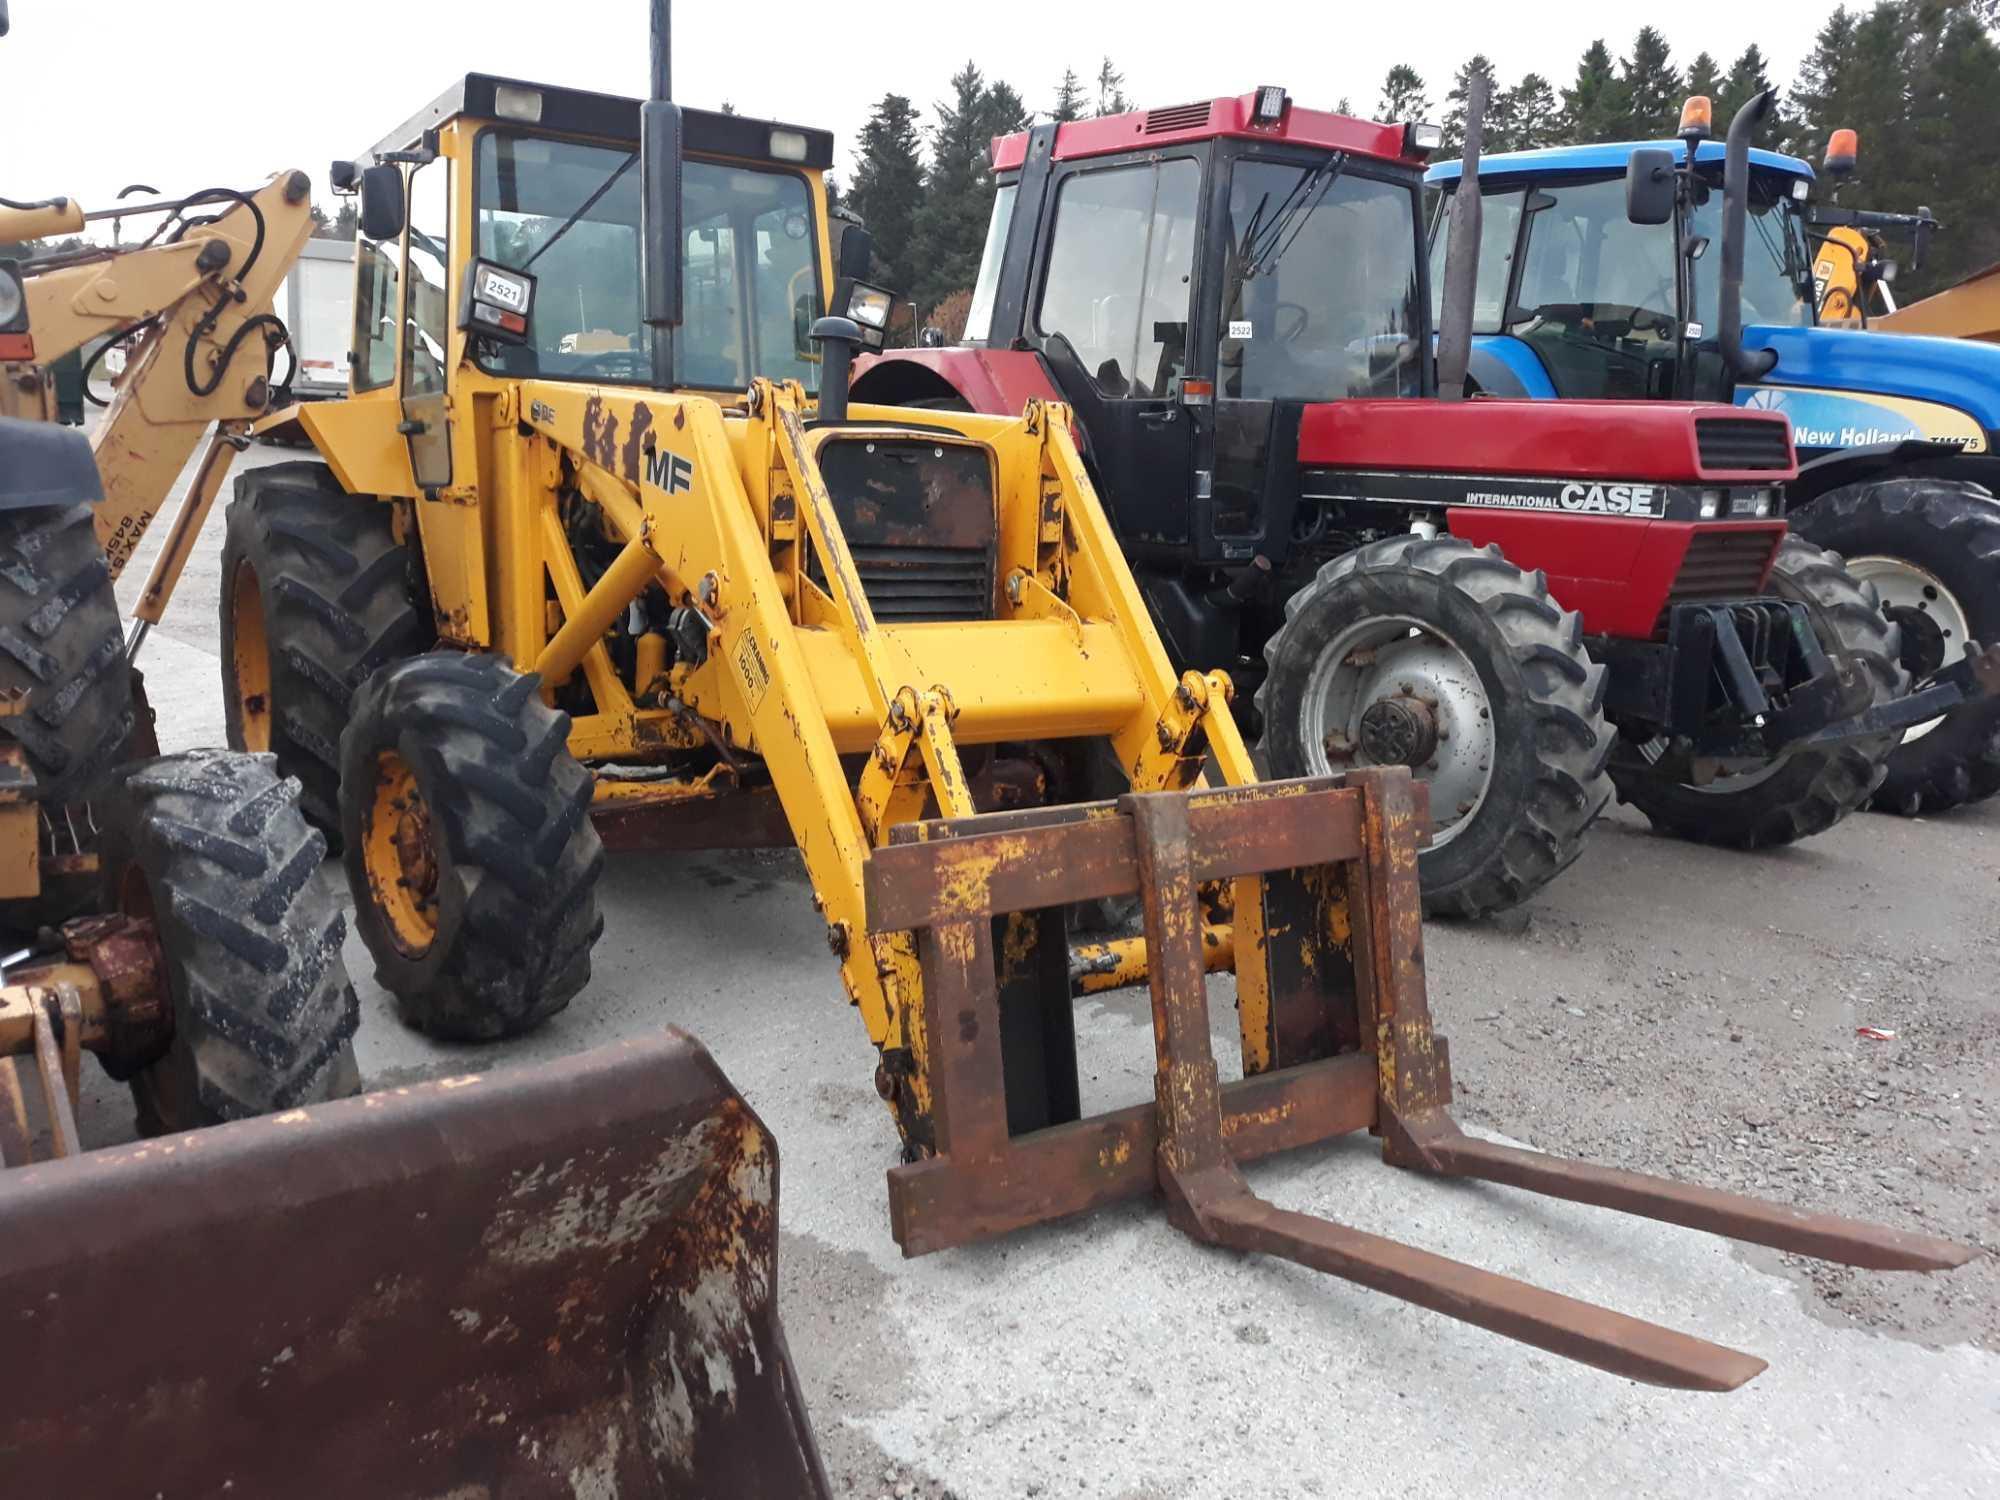 Lot 2521 - Massey Ferguson Loading Shovel MF50EX - 0cc X - Other